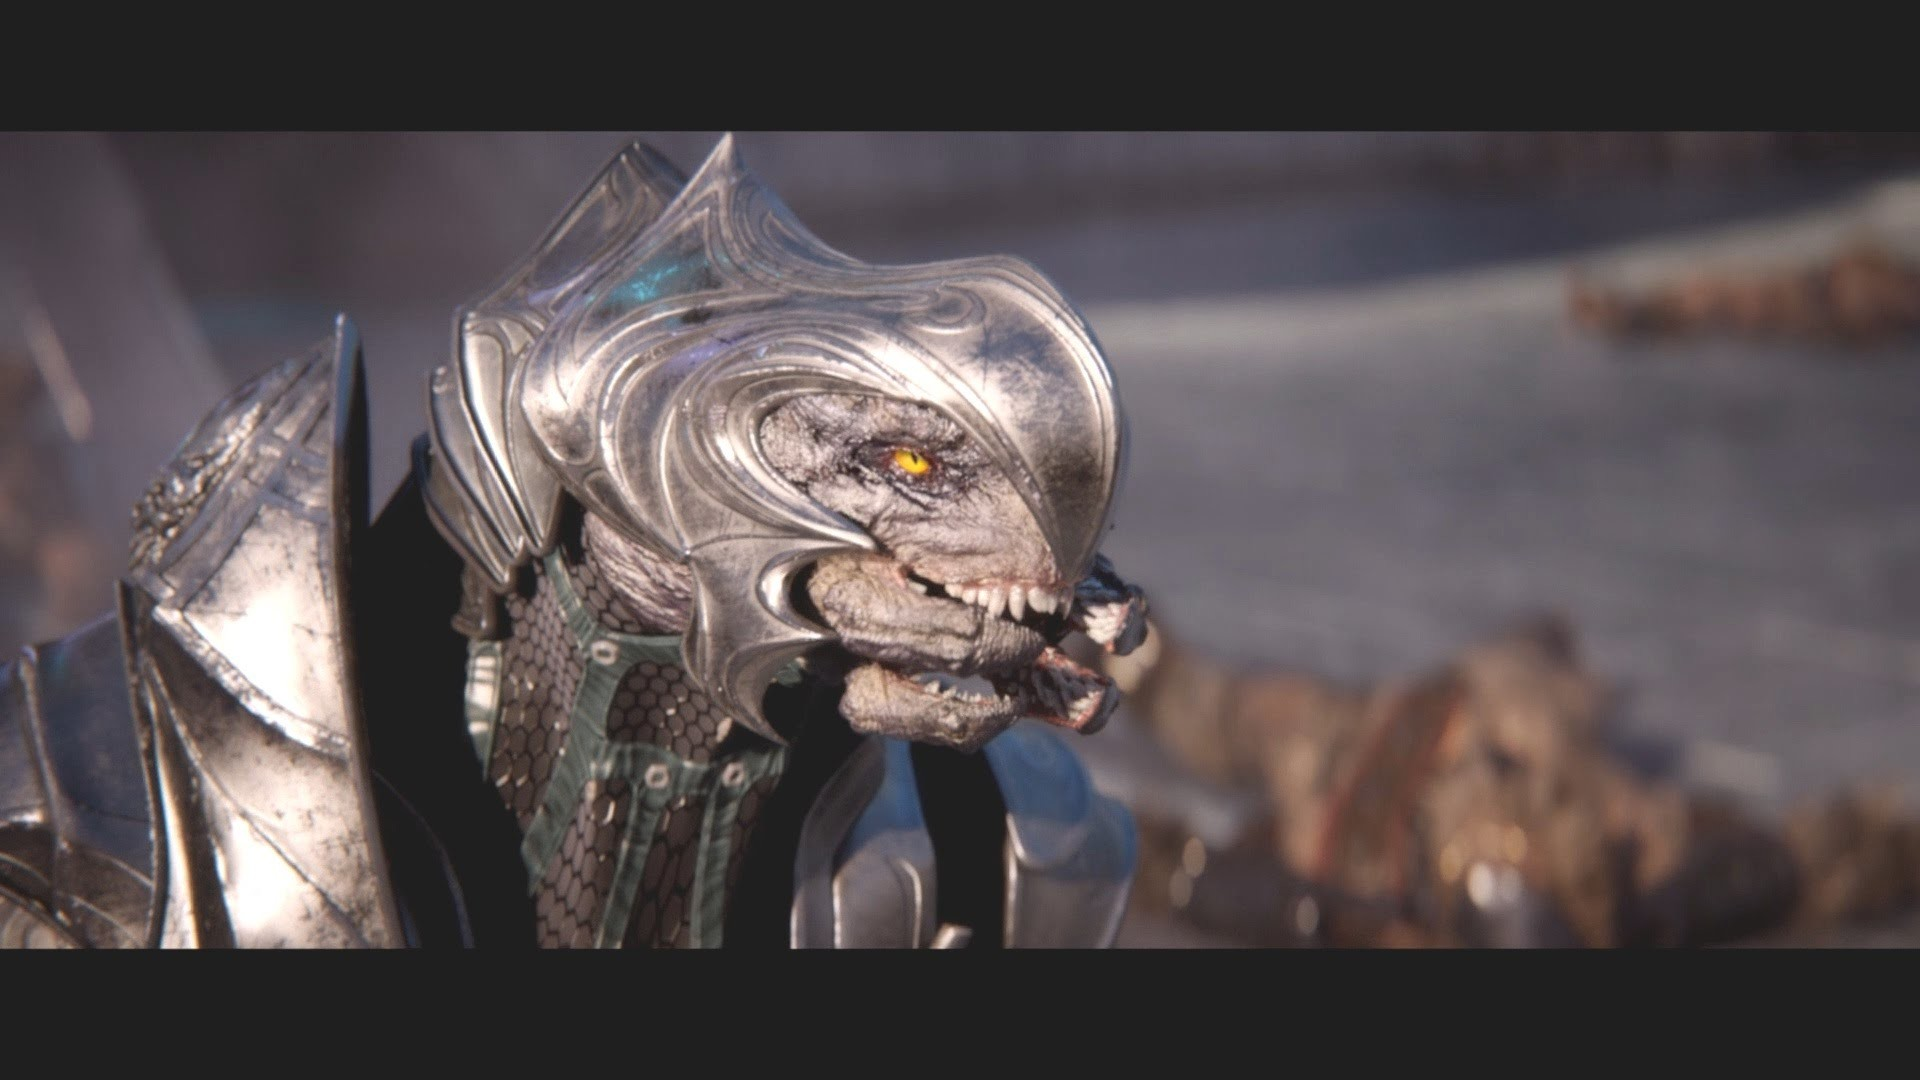 Arbiter's Halo 2 Anniversary Cutscenes Remastered by Blur Studios [1080p @  60fps] – YouTube